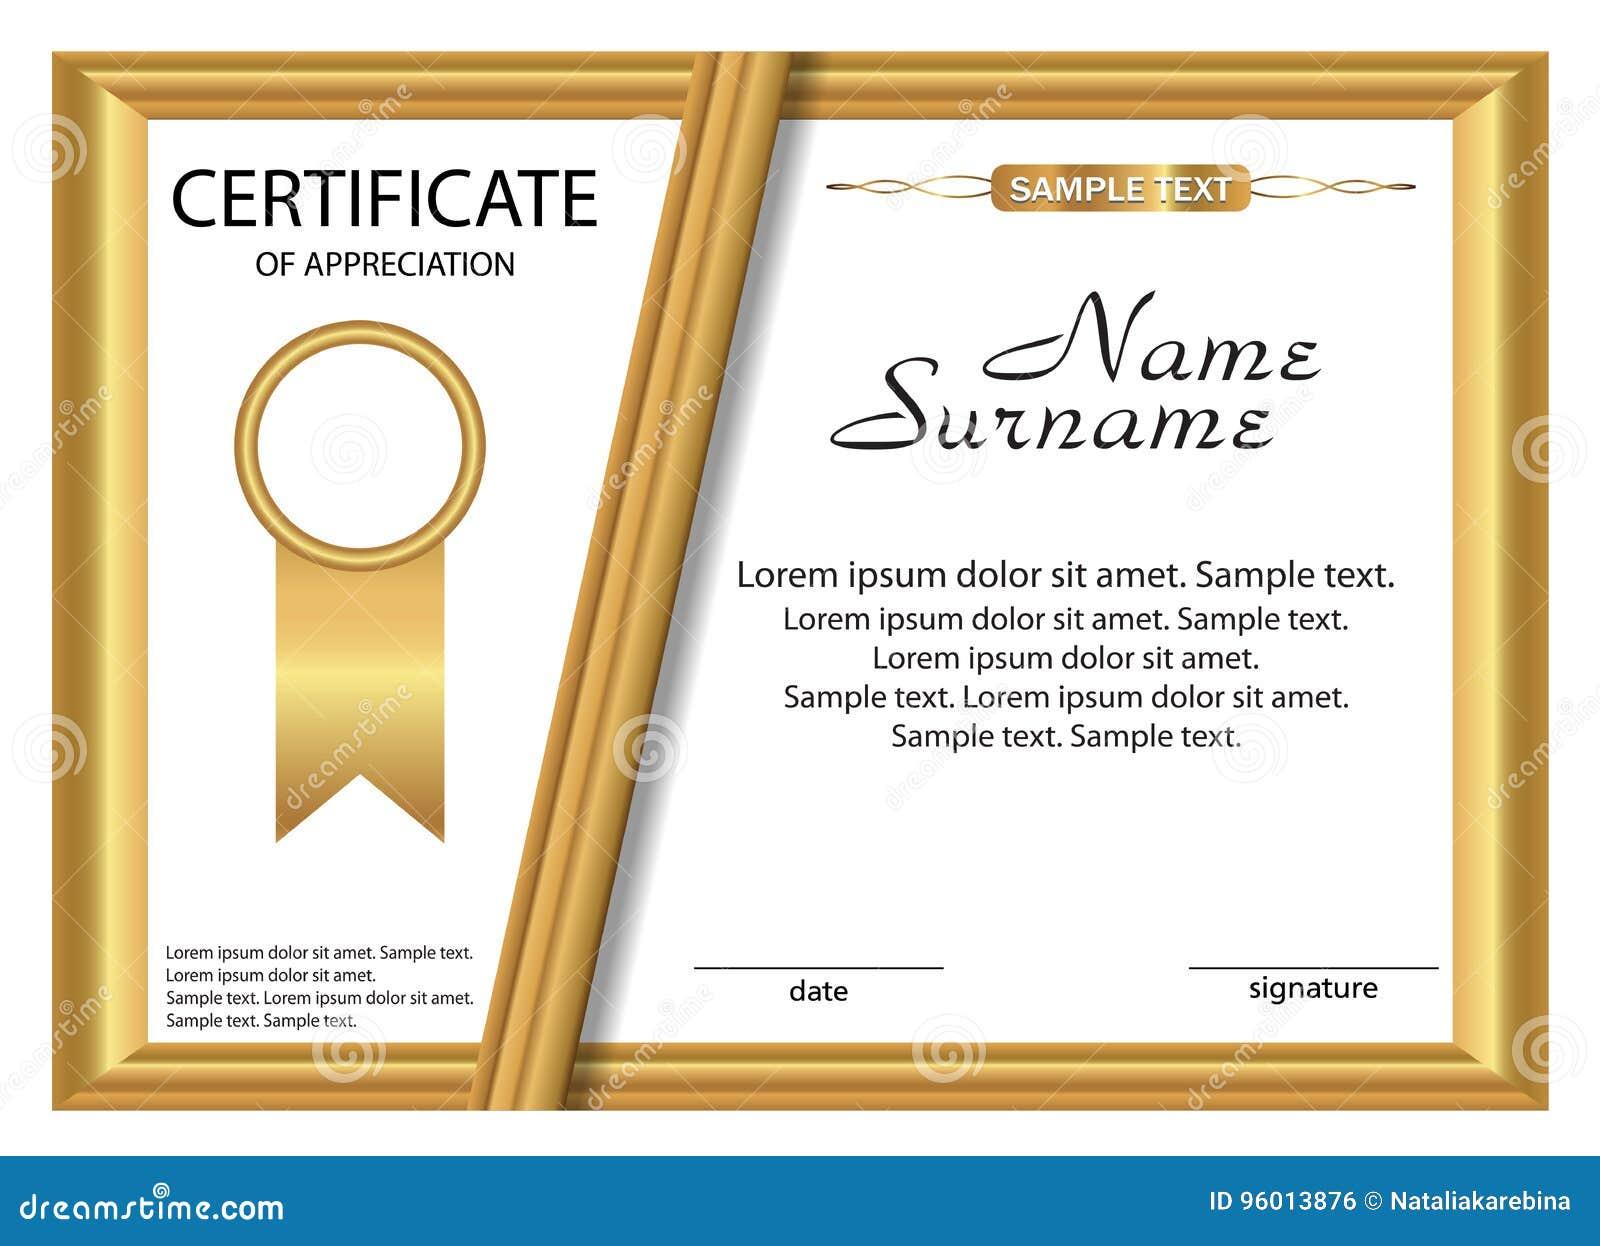 Certificate of appreciation template in vector cartoon vector certificate of appreciation template in vector cartoon vector cartoondealer 67822931 yadclub Gallery